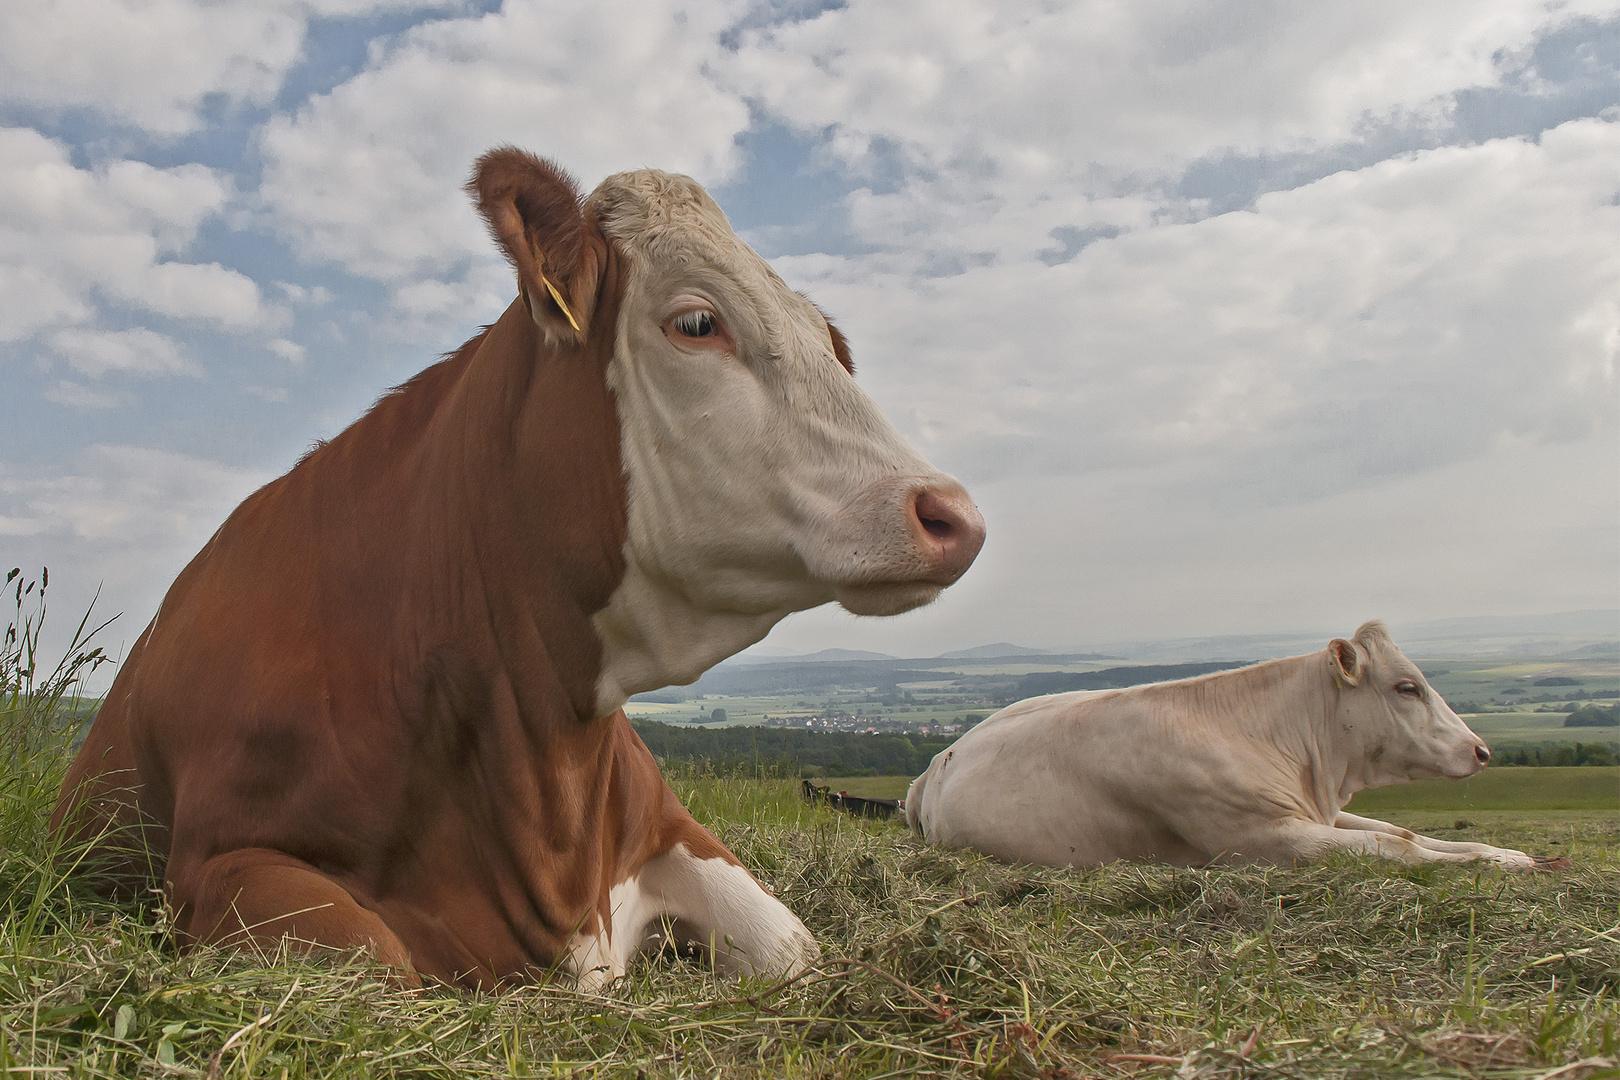 Kühe am morgen erwarten den Tag